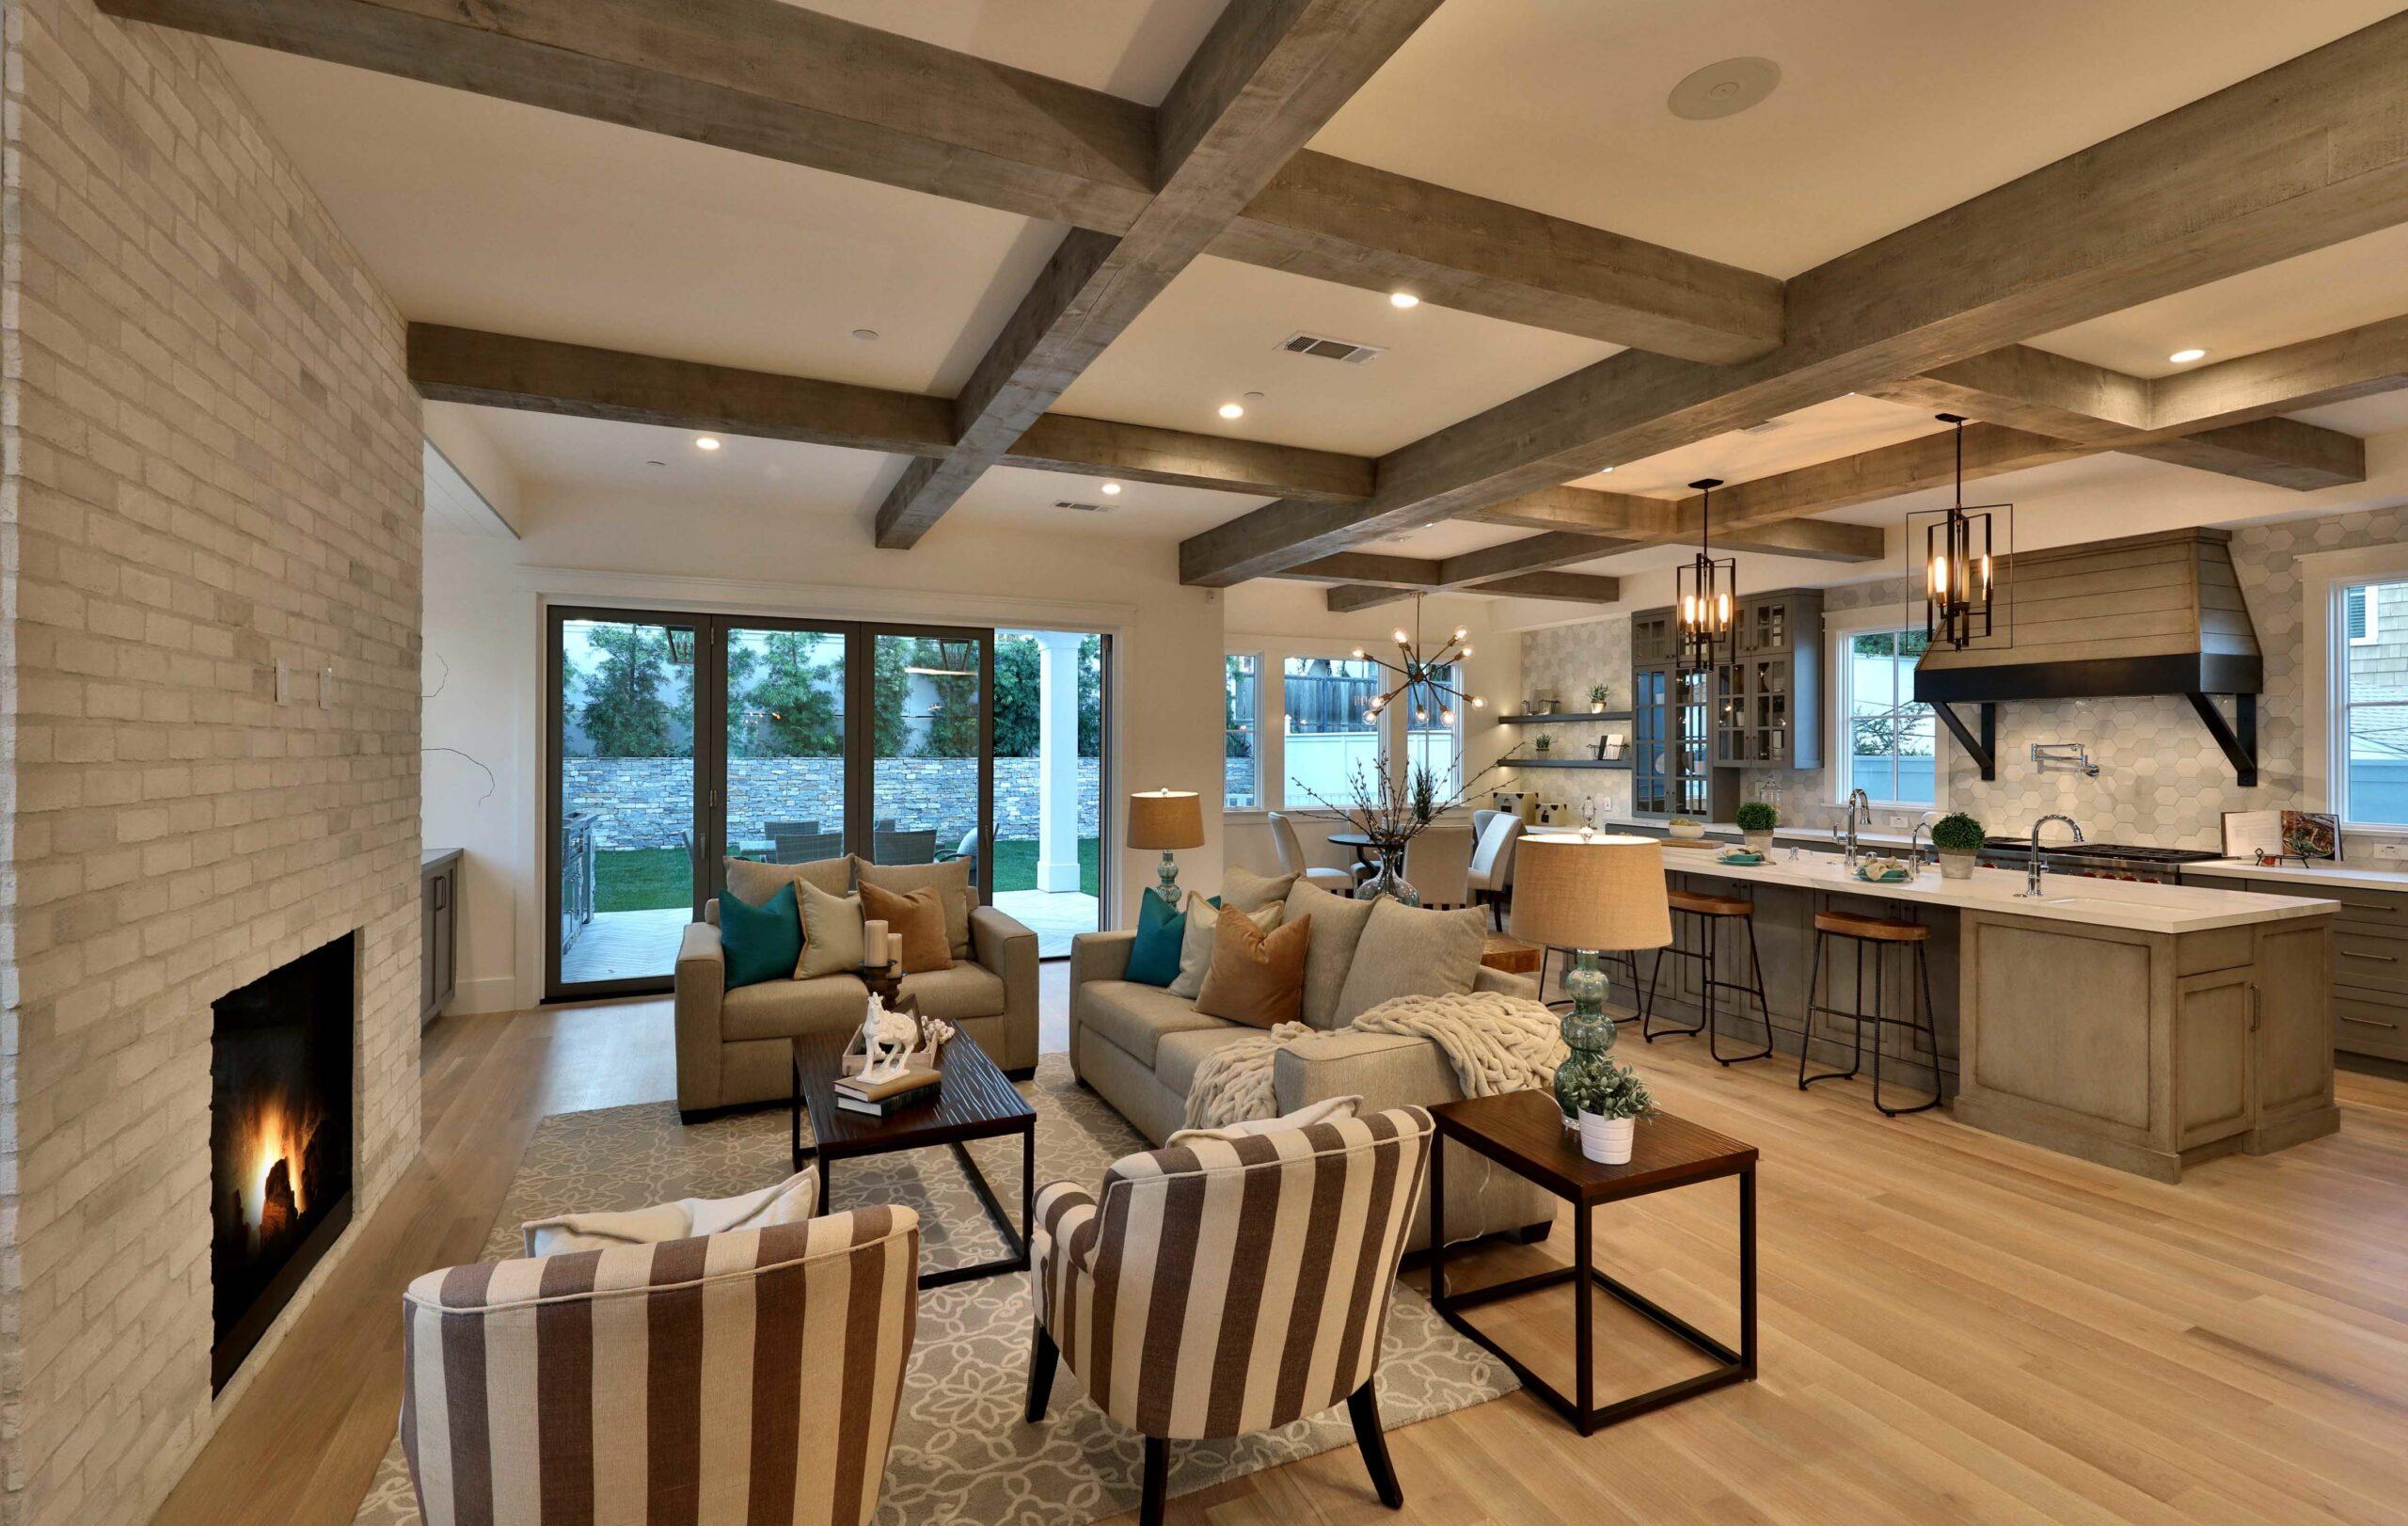 South Redondo Beach home prices up